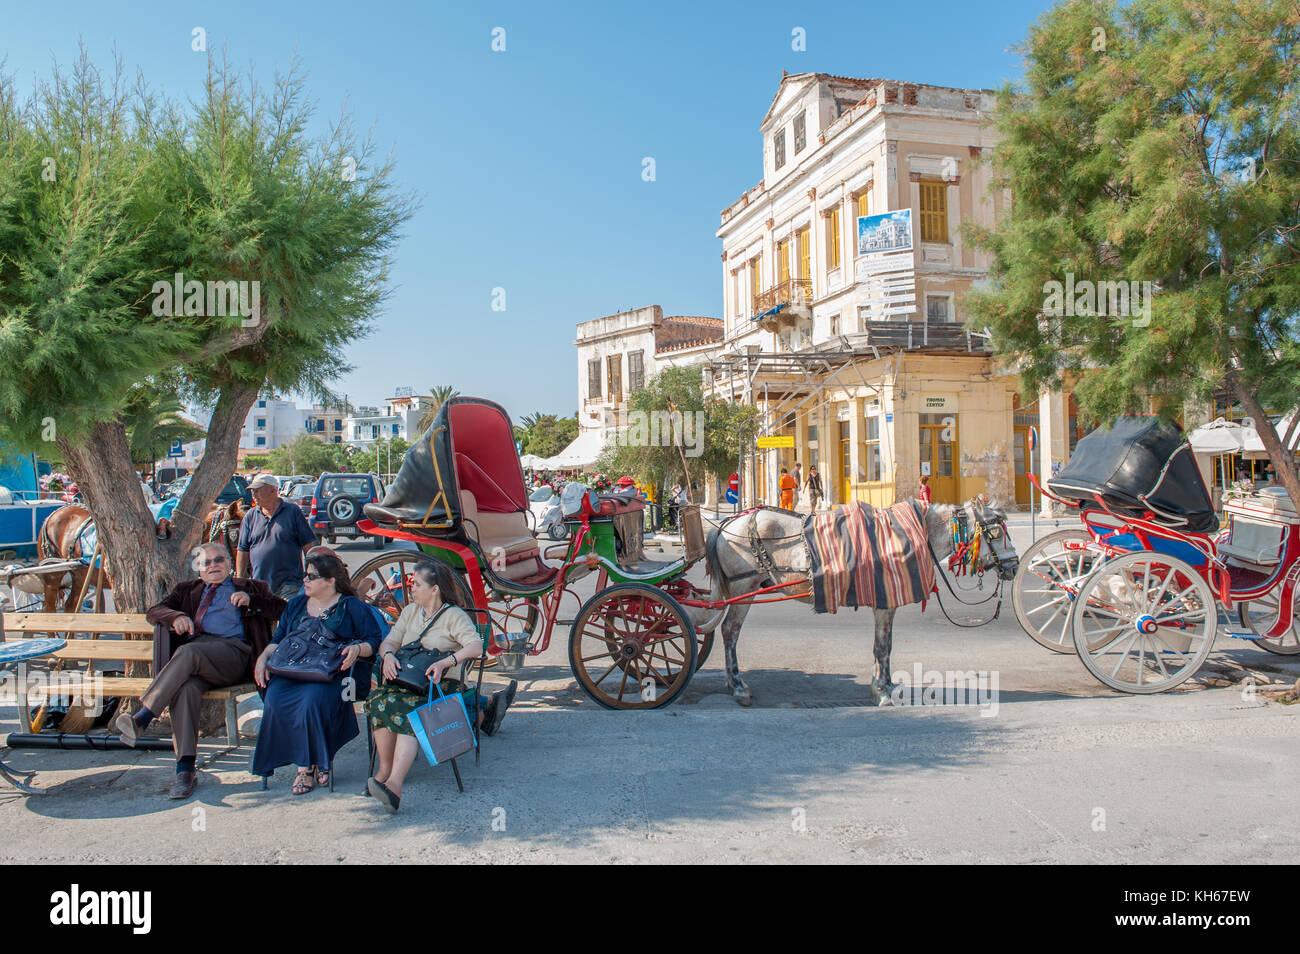 Urban scene from Aegina. Aegina is a Greek island in the Aegean sea belonging to the Saronic islands. - Stock Image